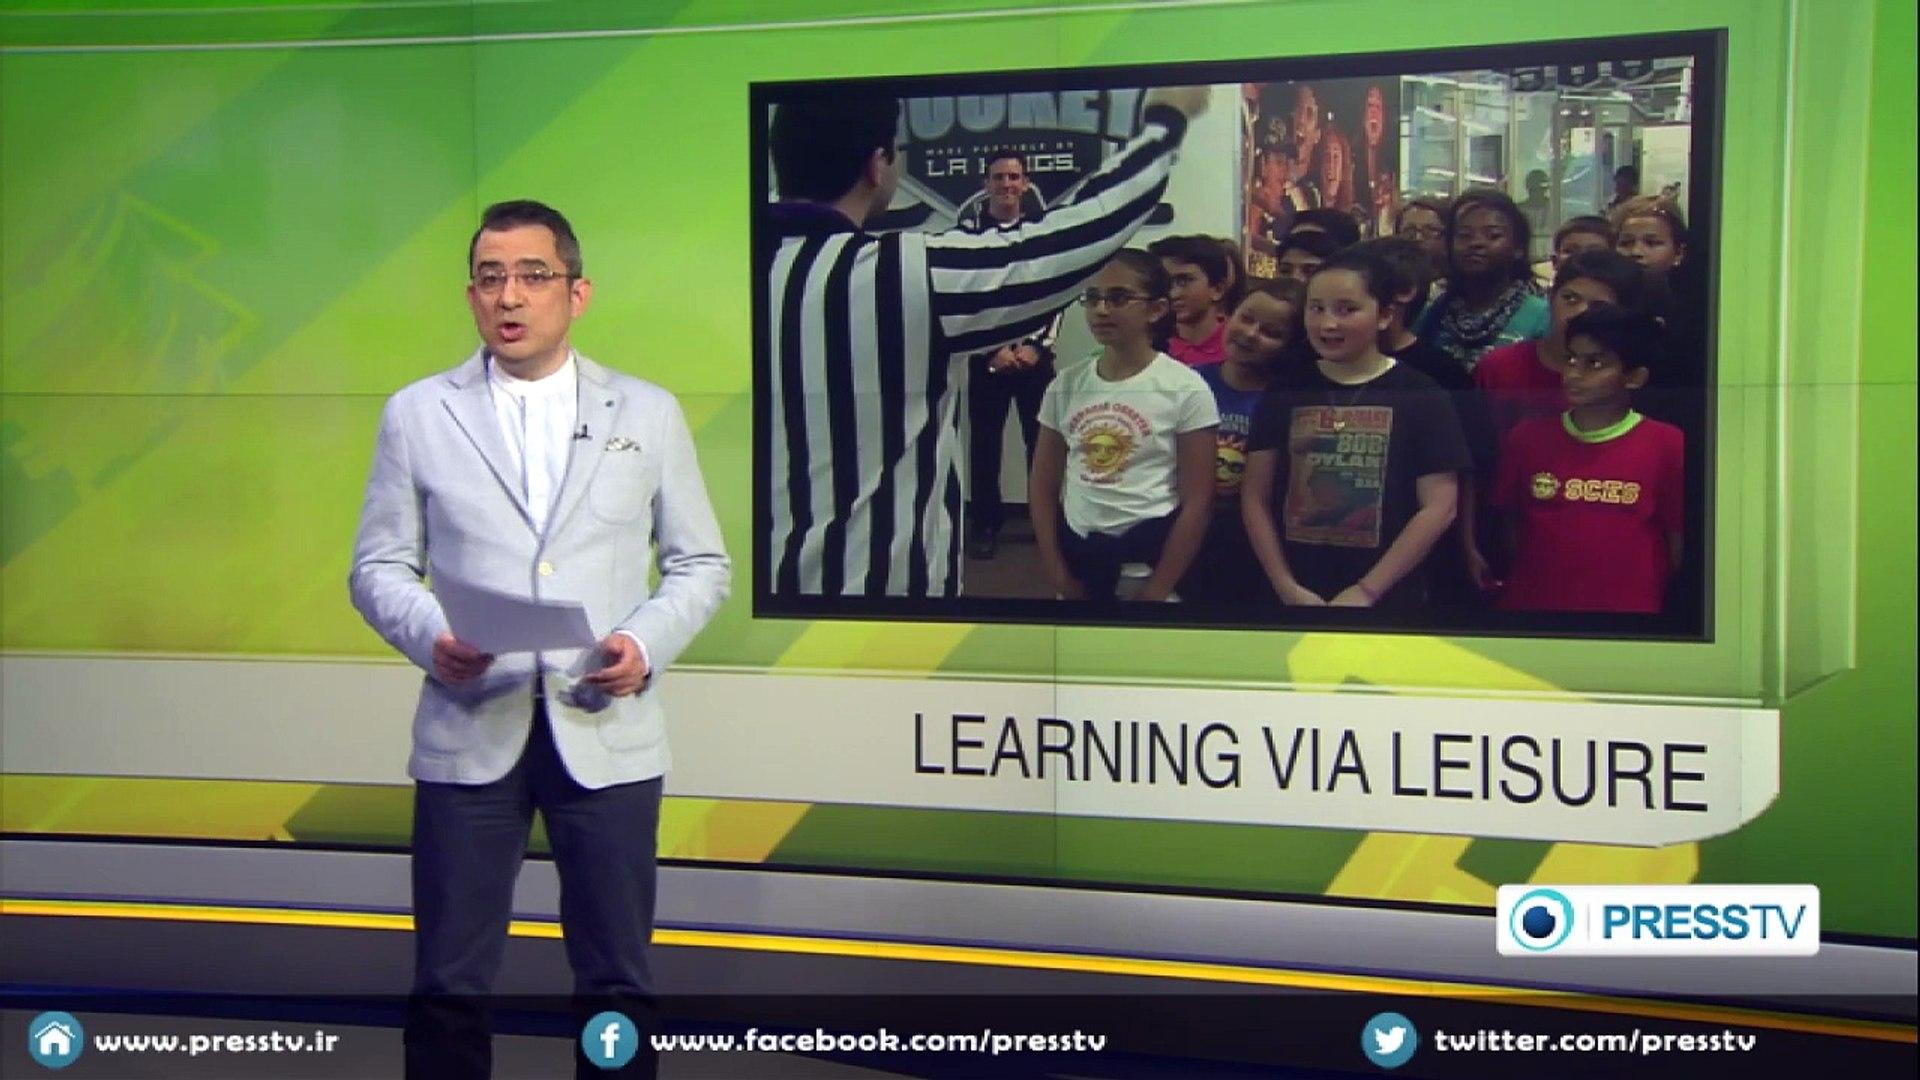 Ice Hockey expo in LA teaching kids science via entertainment